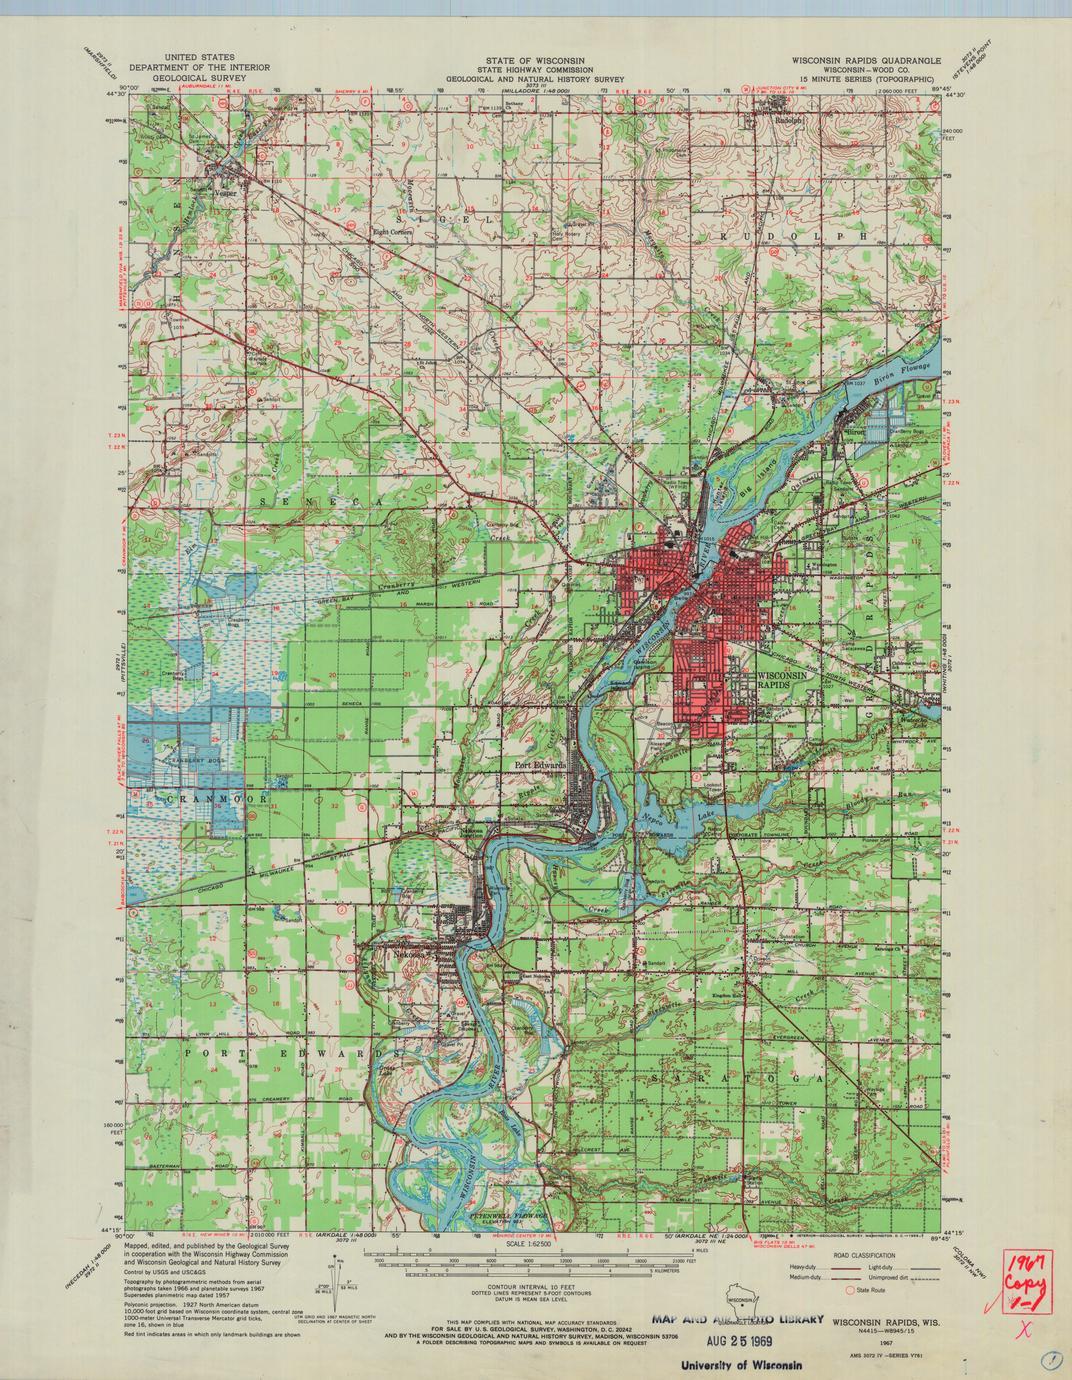 Wisconsin Rapids quadrangle